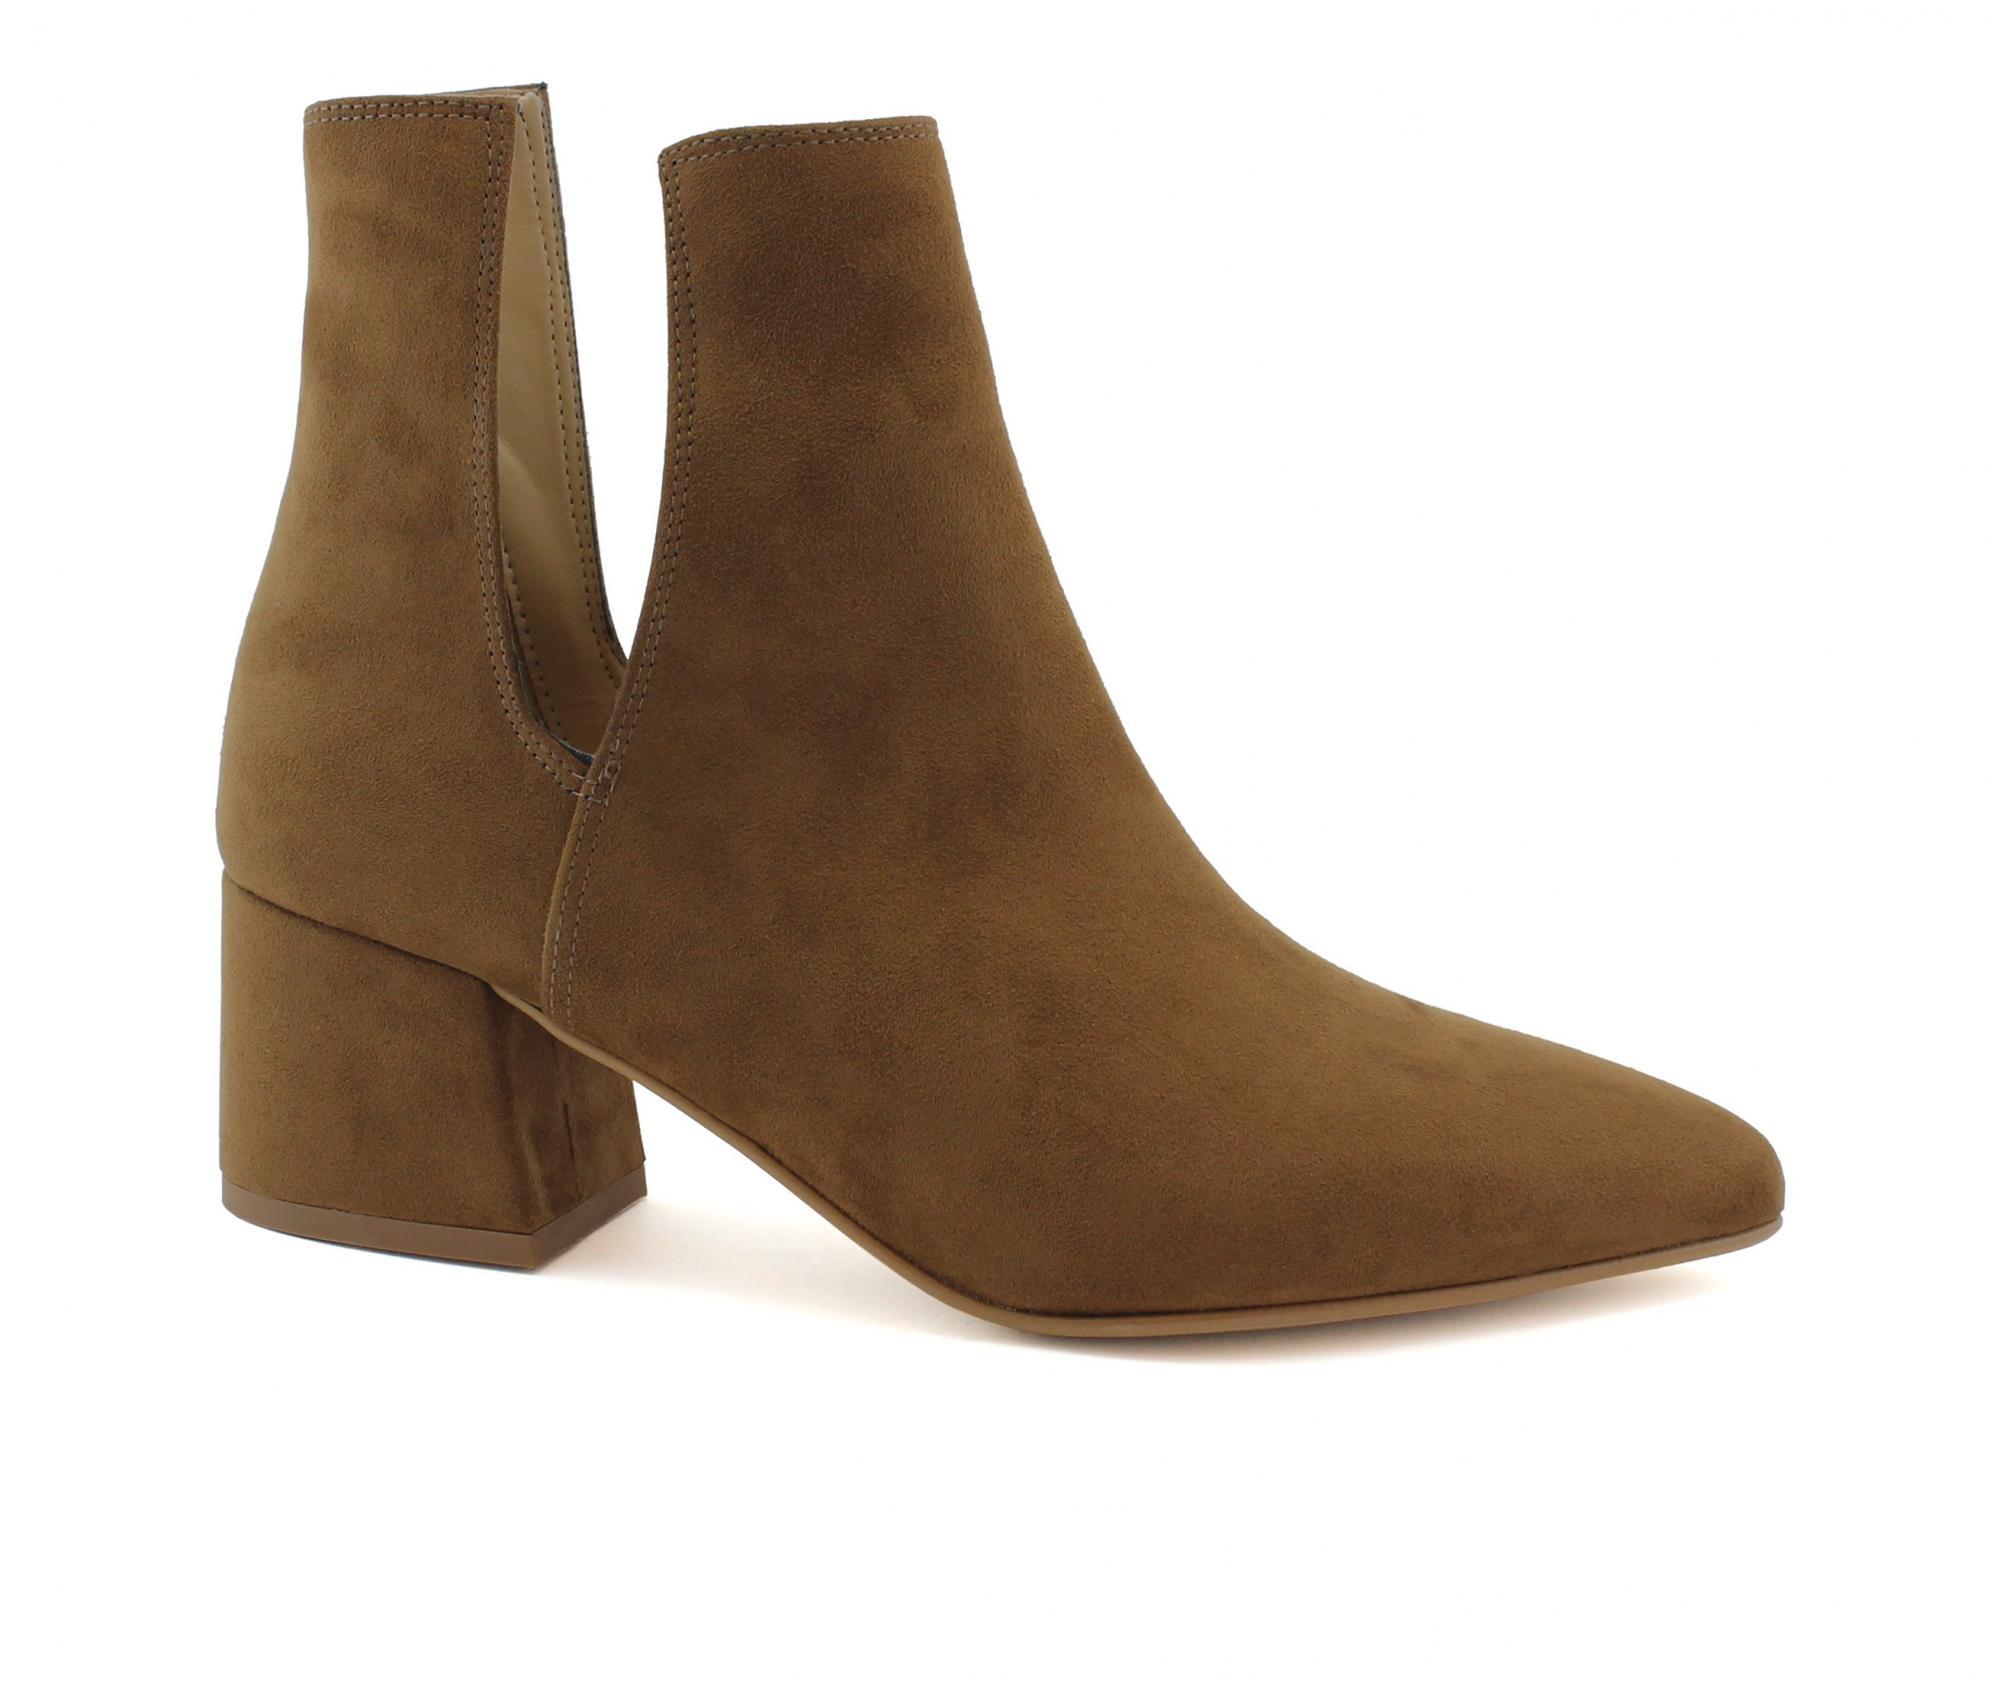 d7824823e1a7ea VSI Damenschuhe Mikrofaser-Ankle-Boots aus Nubukleder-Effekt vegane Schuhe  Made in Italy - VeganShoes.it